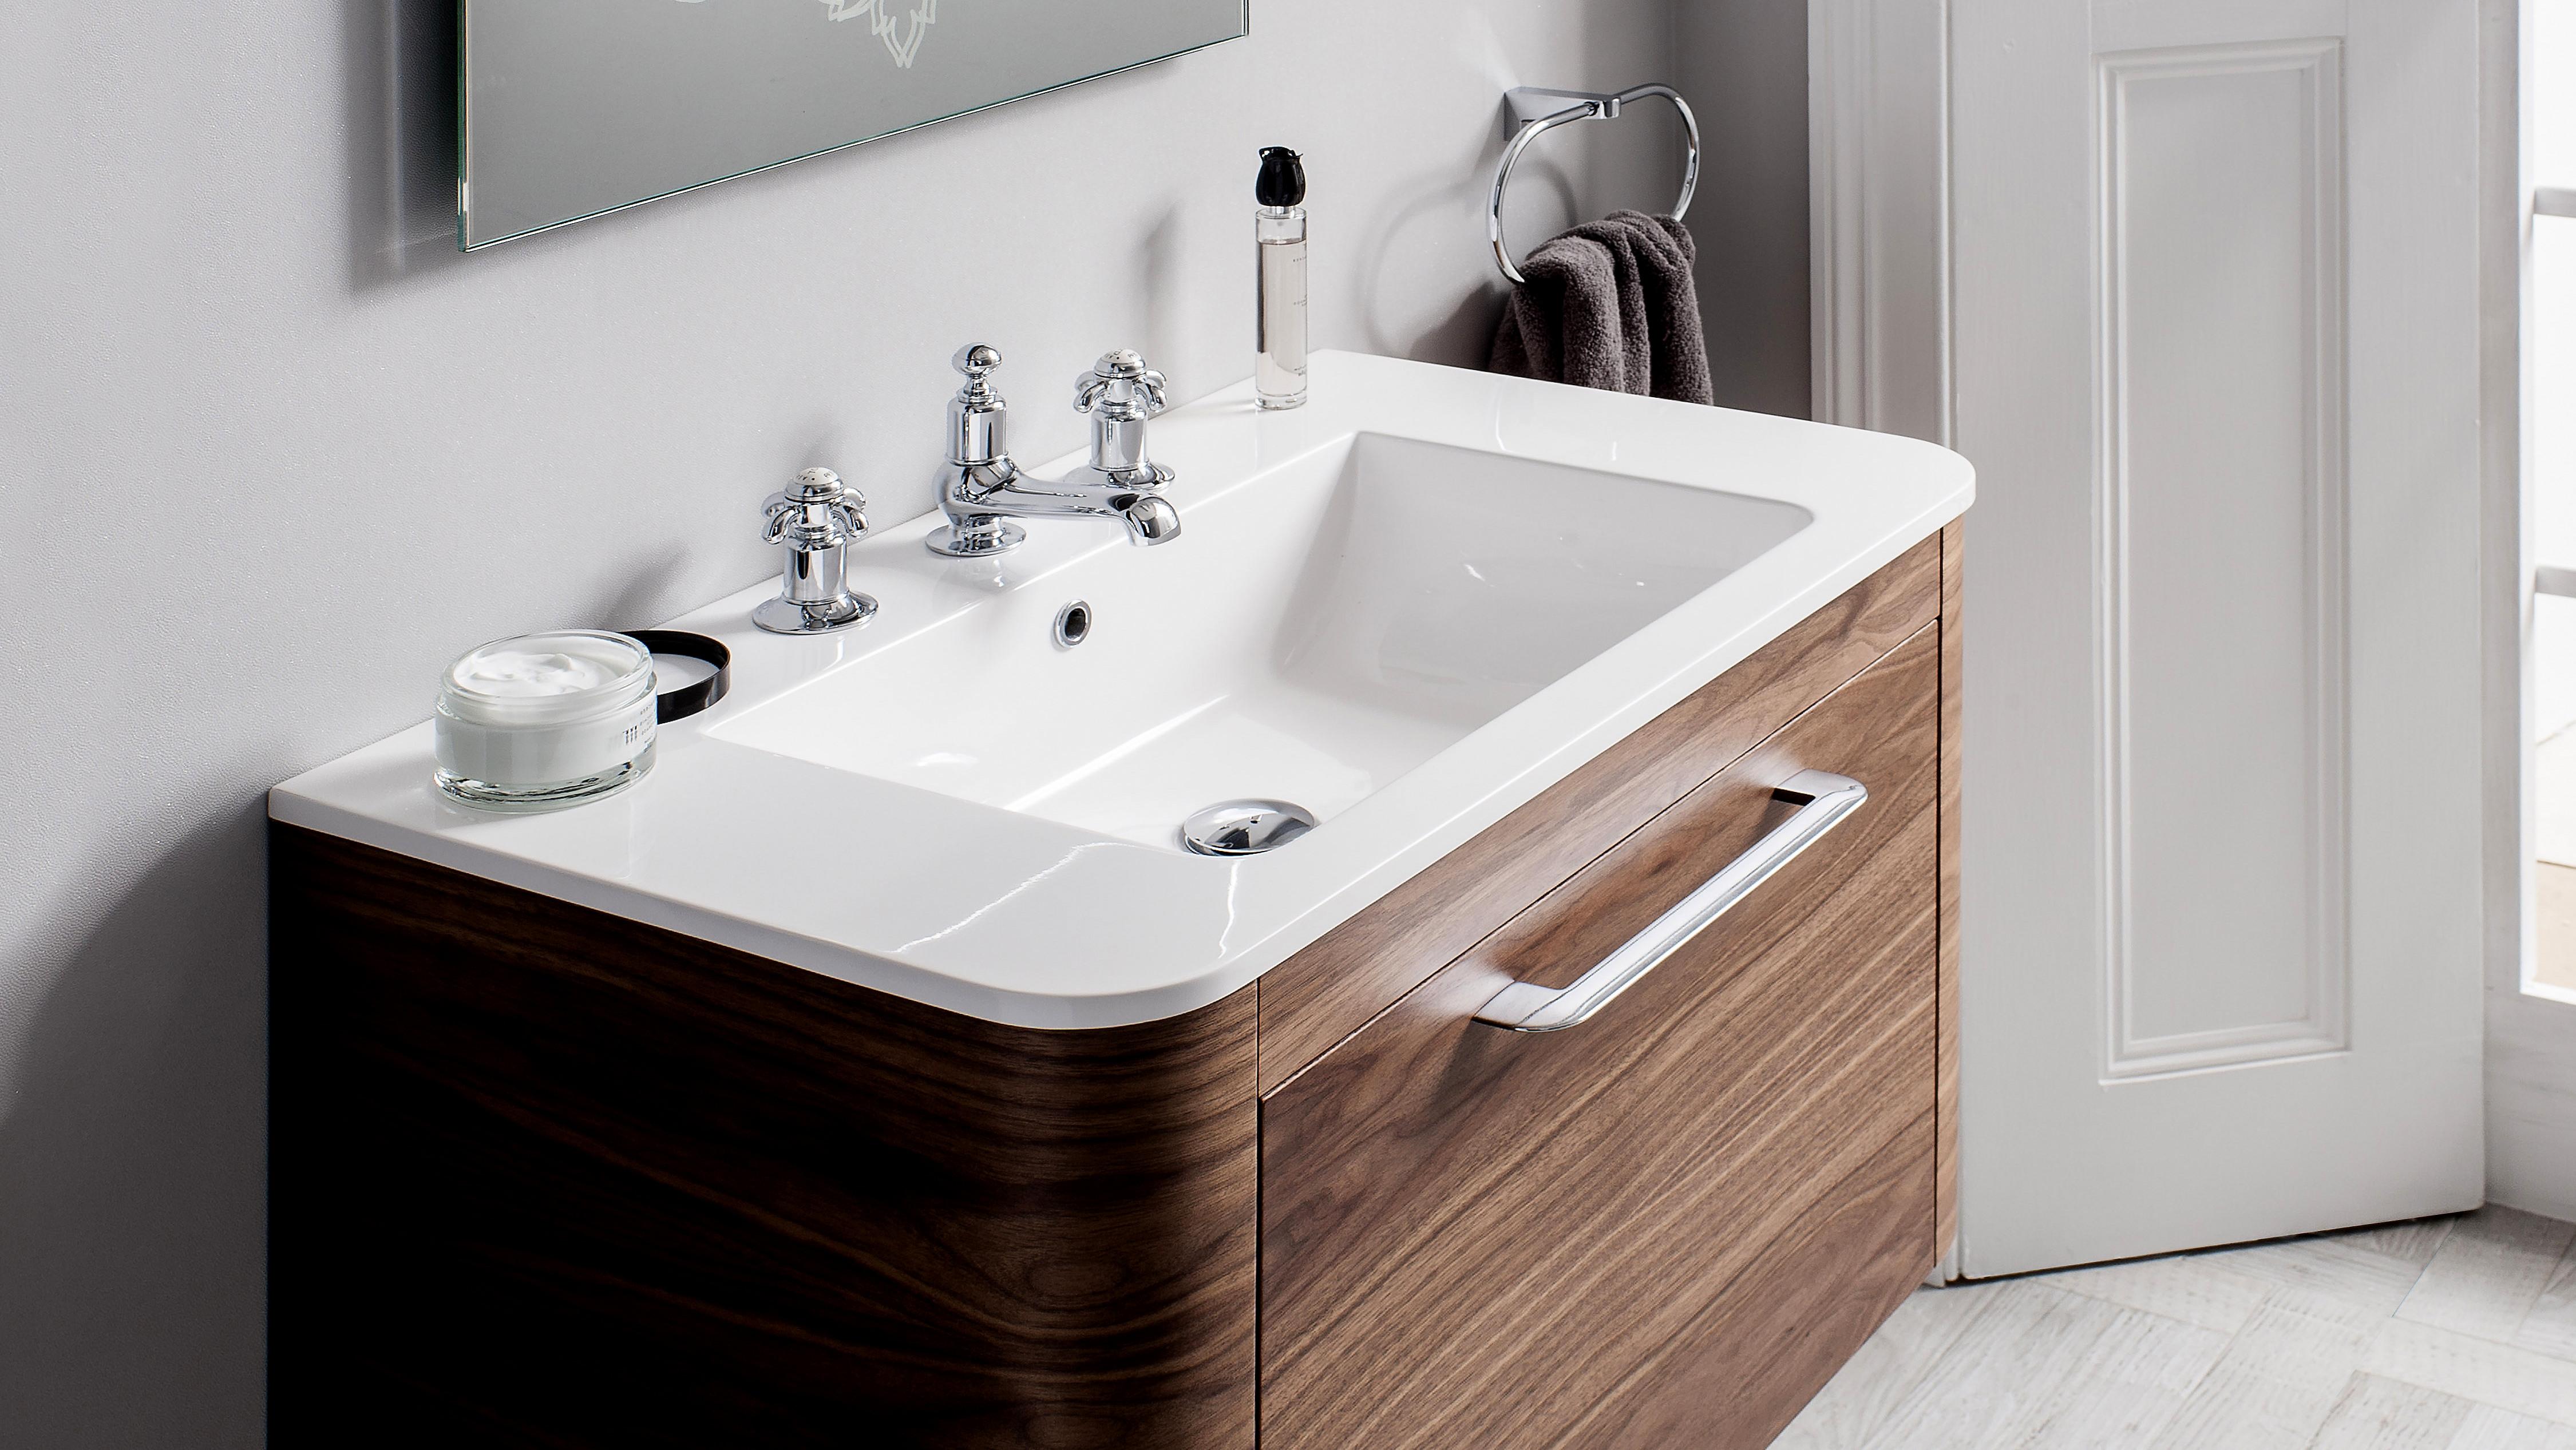 Bauhaus ceramicware cabinets storage solutions shop for Bauhaus design shop